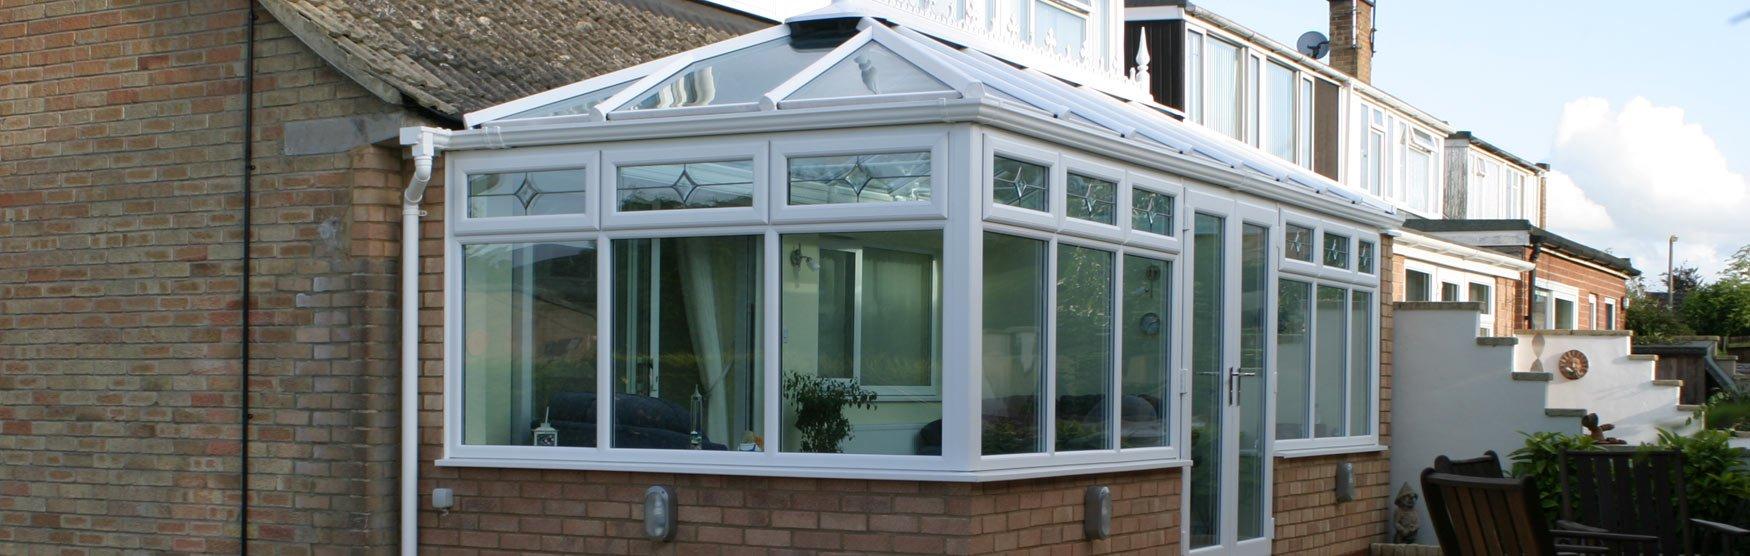 slider-conservatory-0020